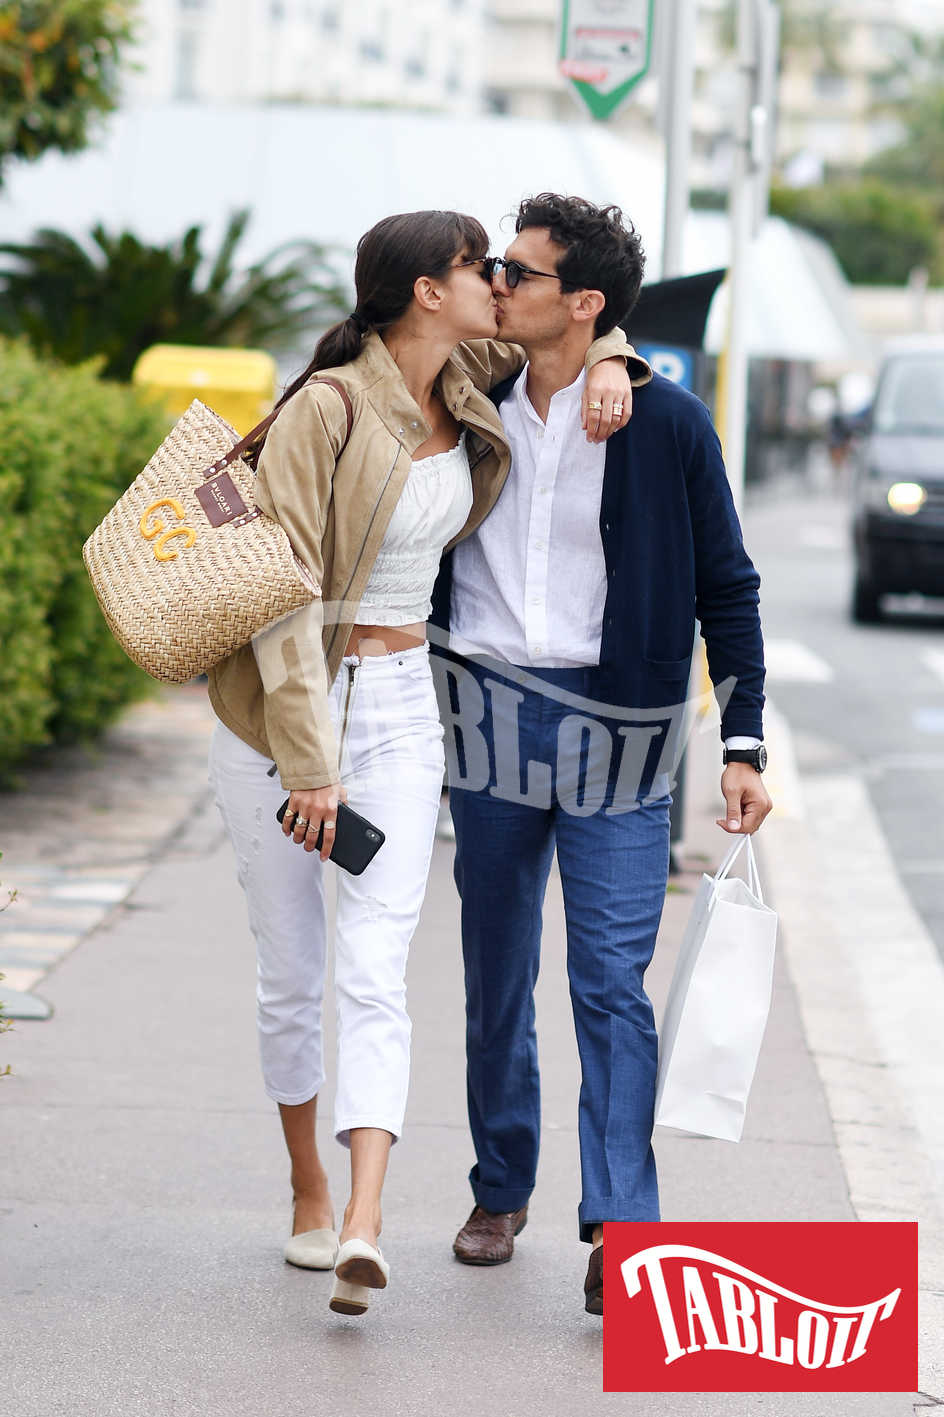 Riccardo Pozzoli e Gabrielle Caunesil bacio